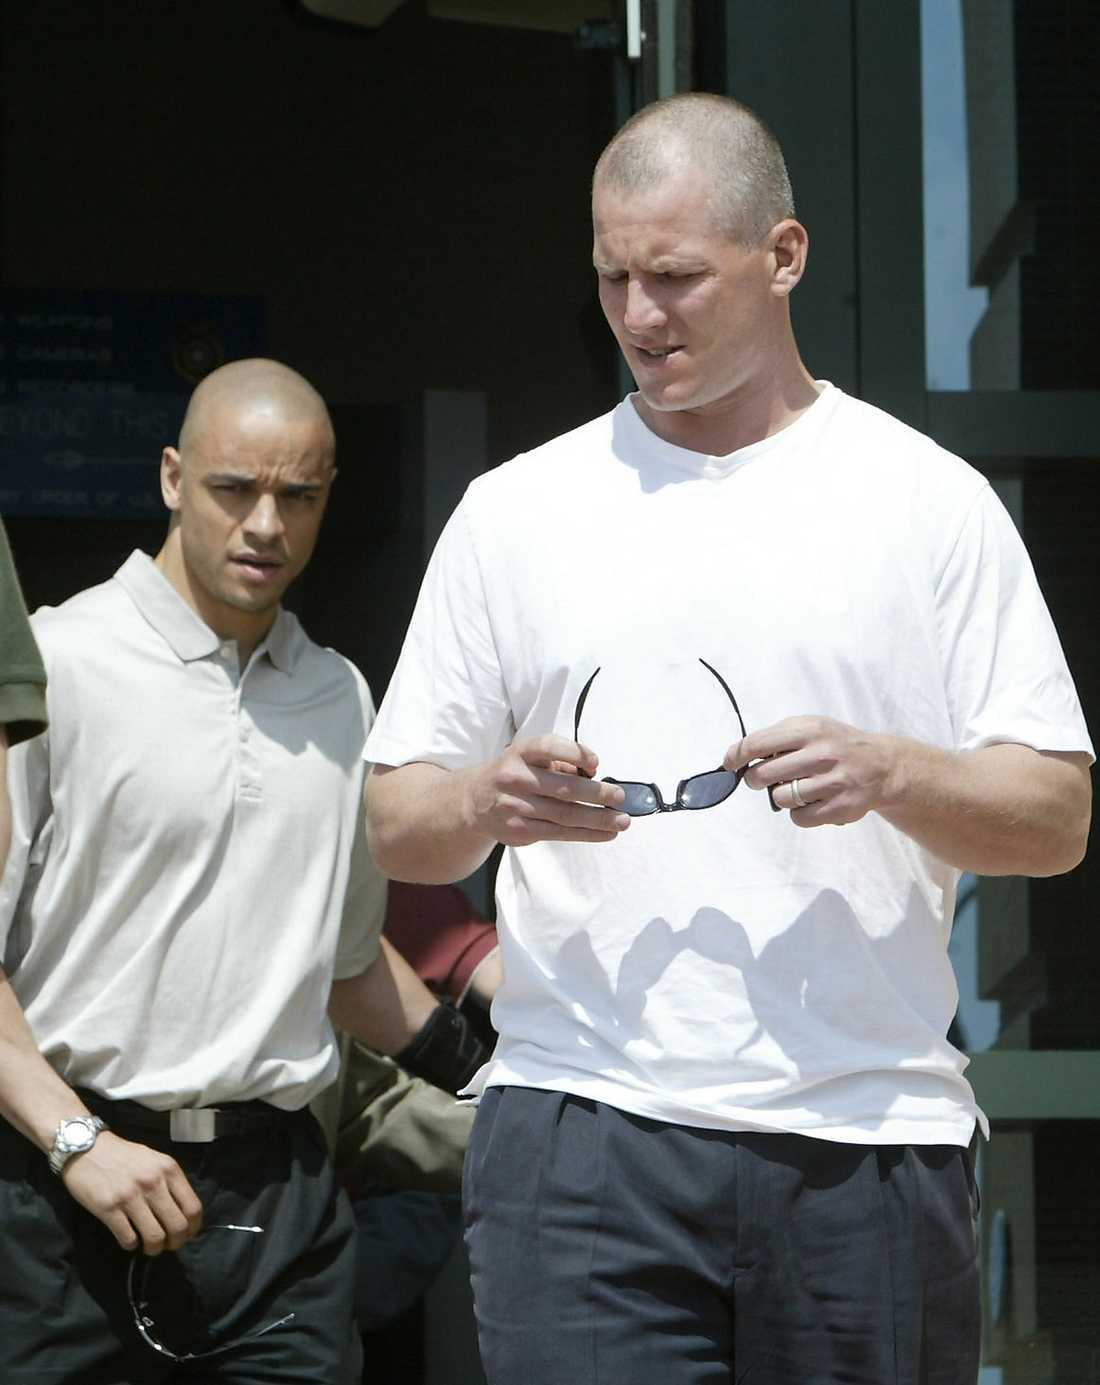 Lagkamraten Keith Tkachuk (mitten) besöker rättegången.